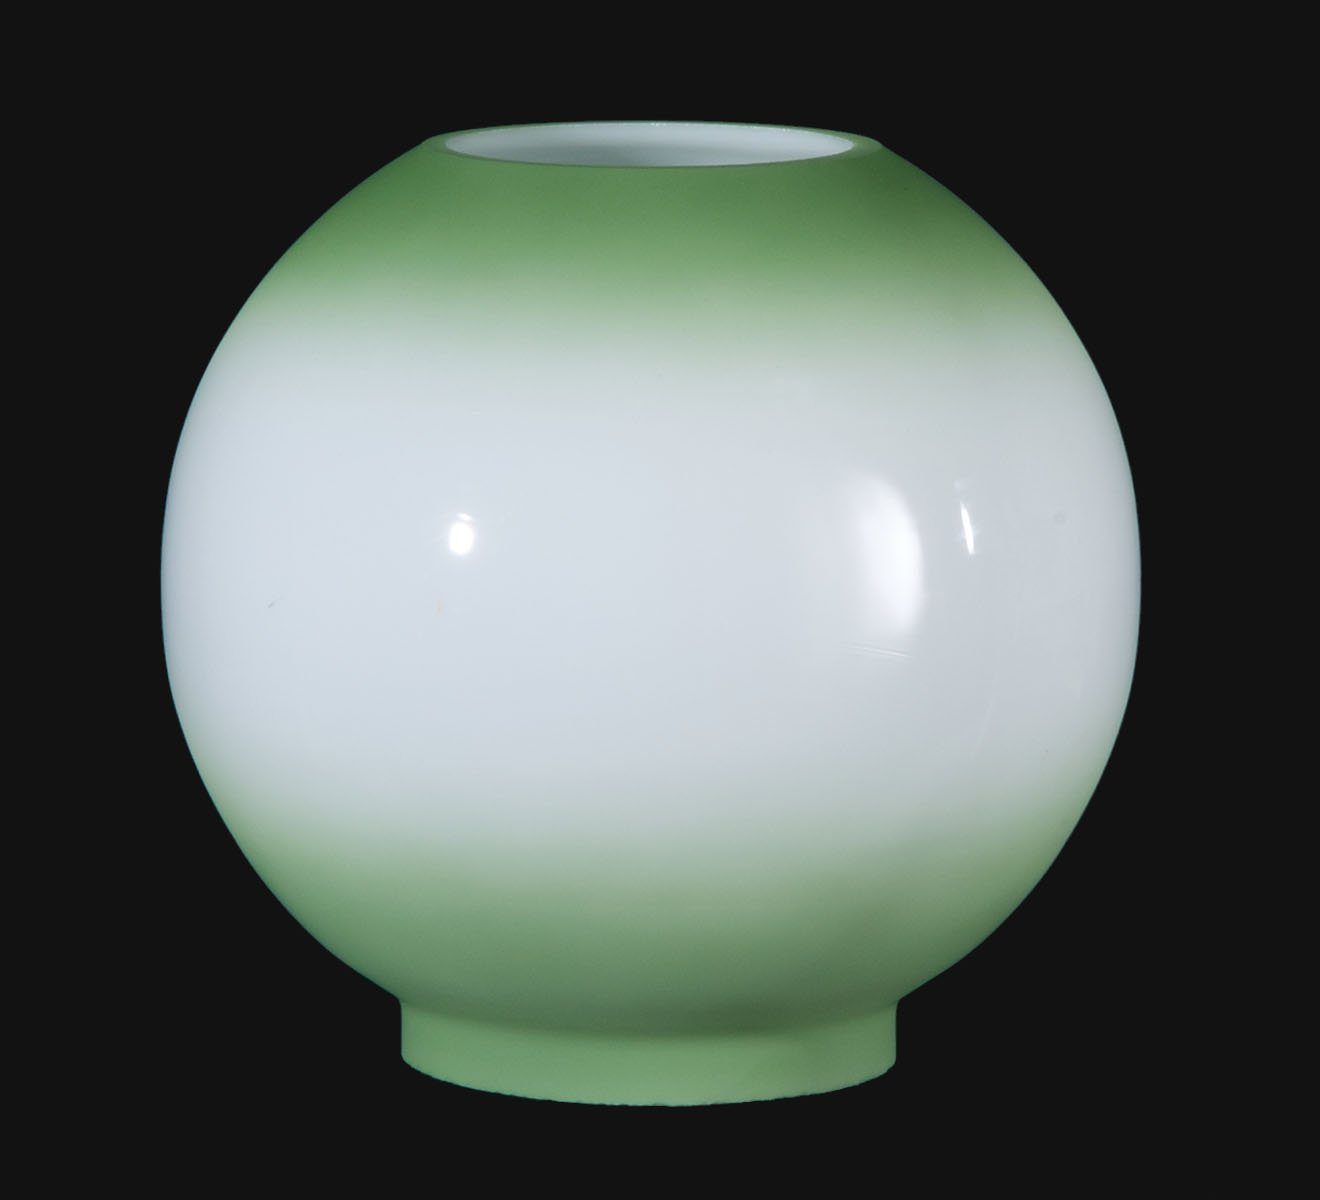 B&P Lamp 8'' Opal Glass Ball Shade, Antique Green Tint by B&P Lamp